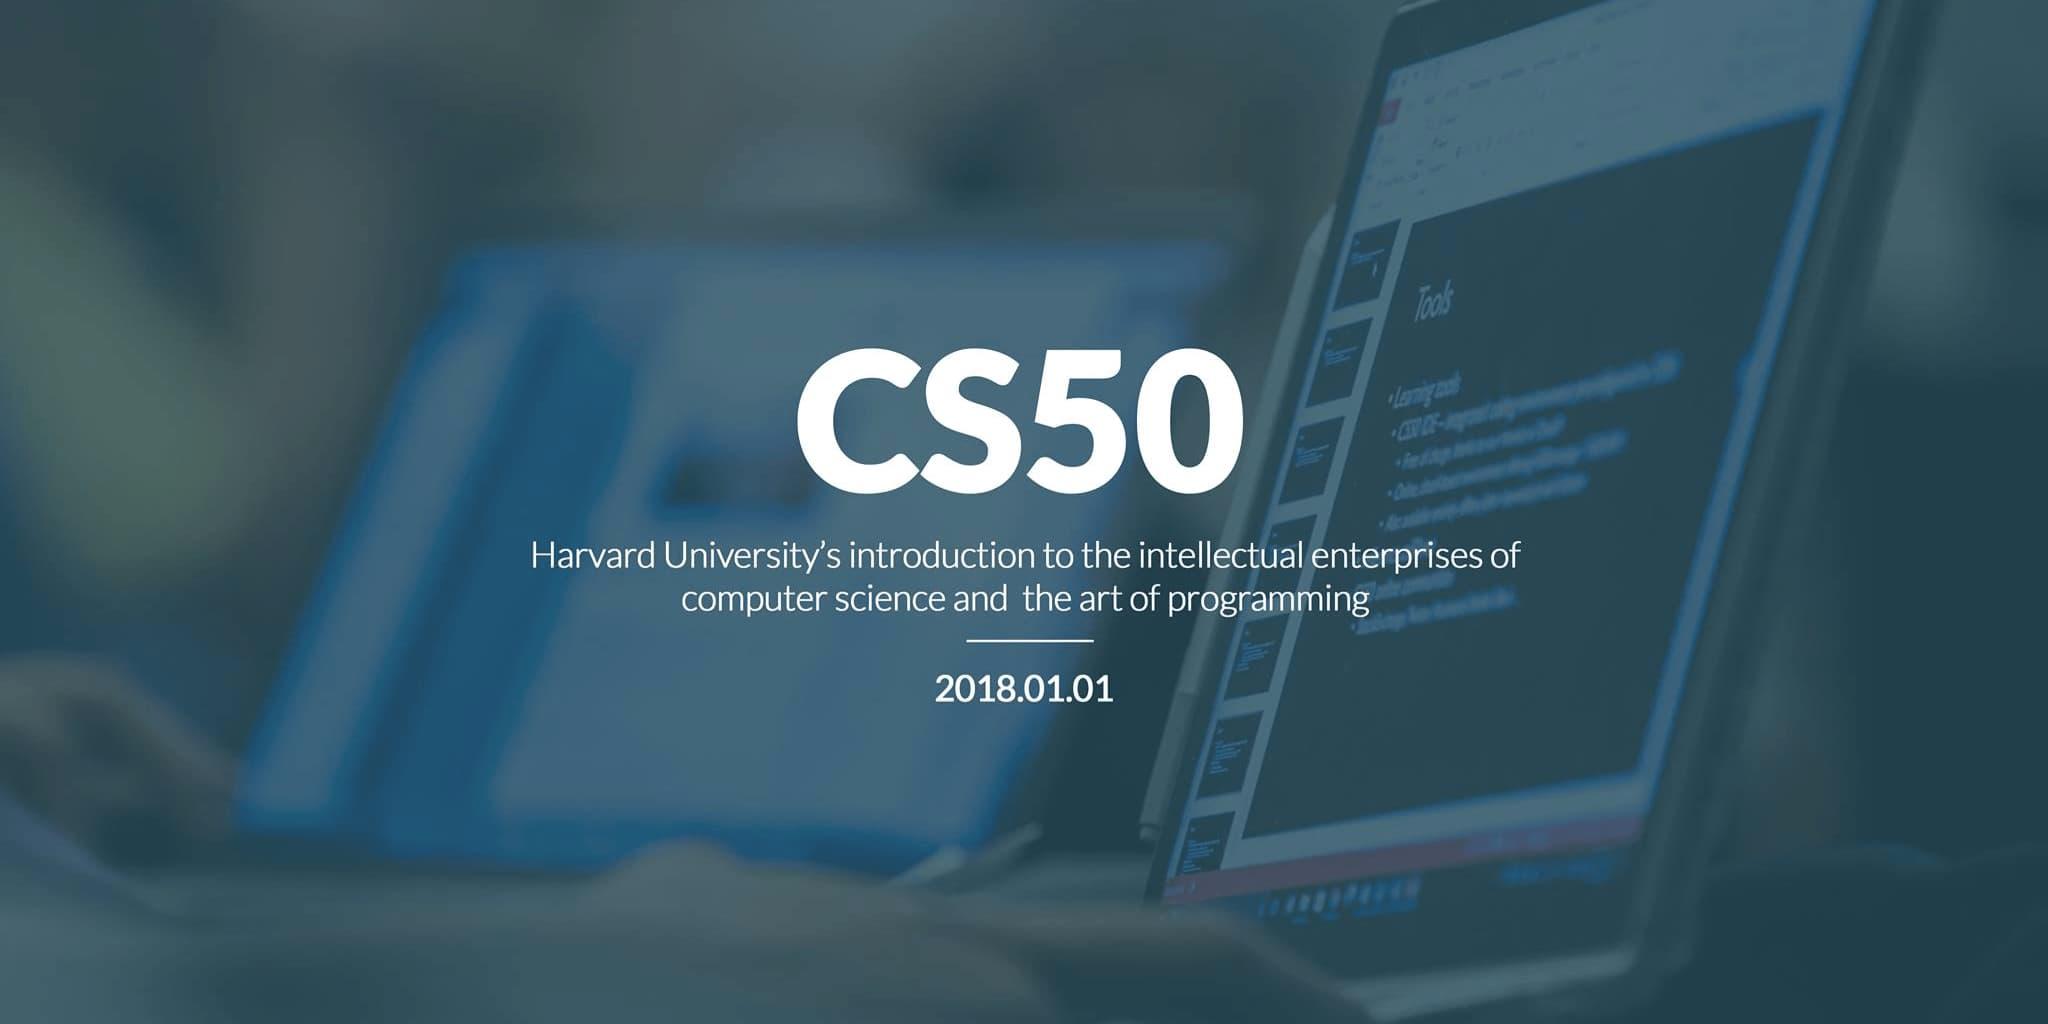 Turing Students CS50